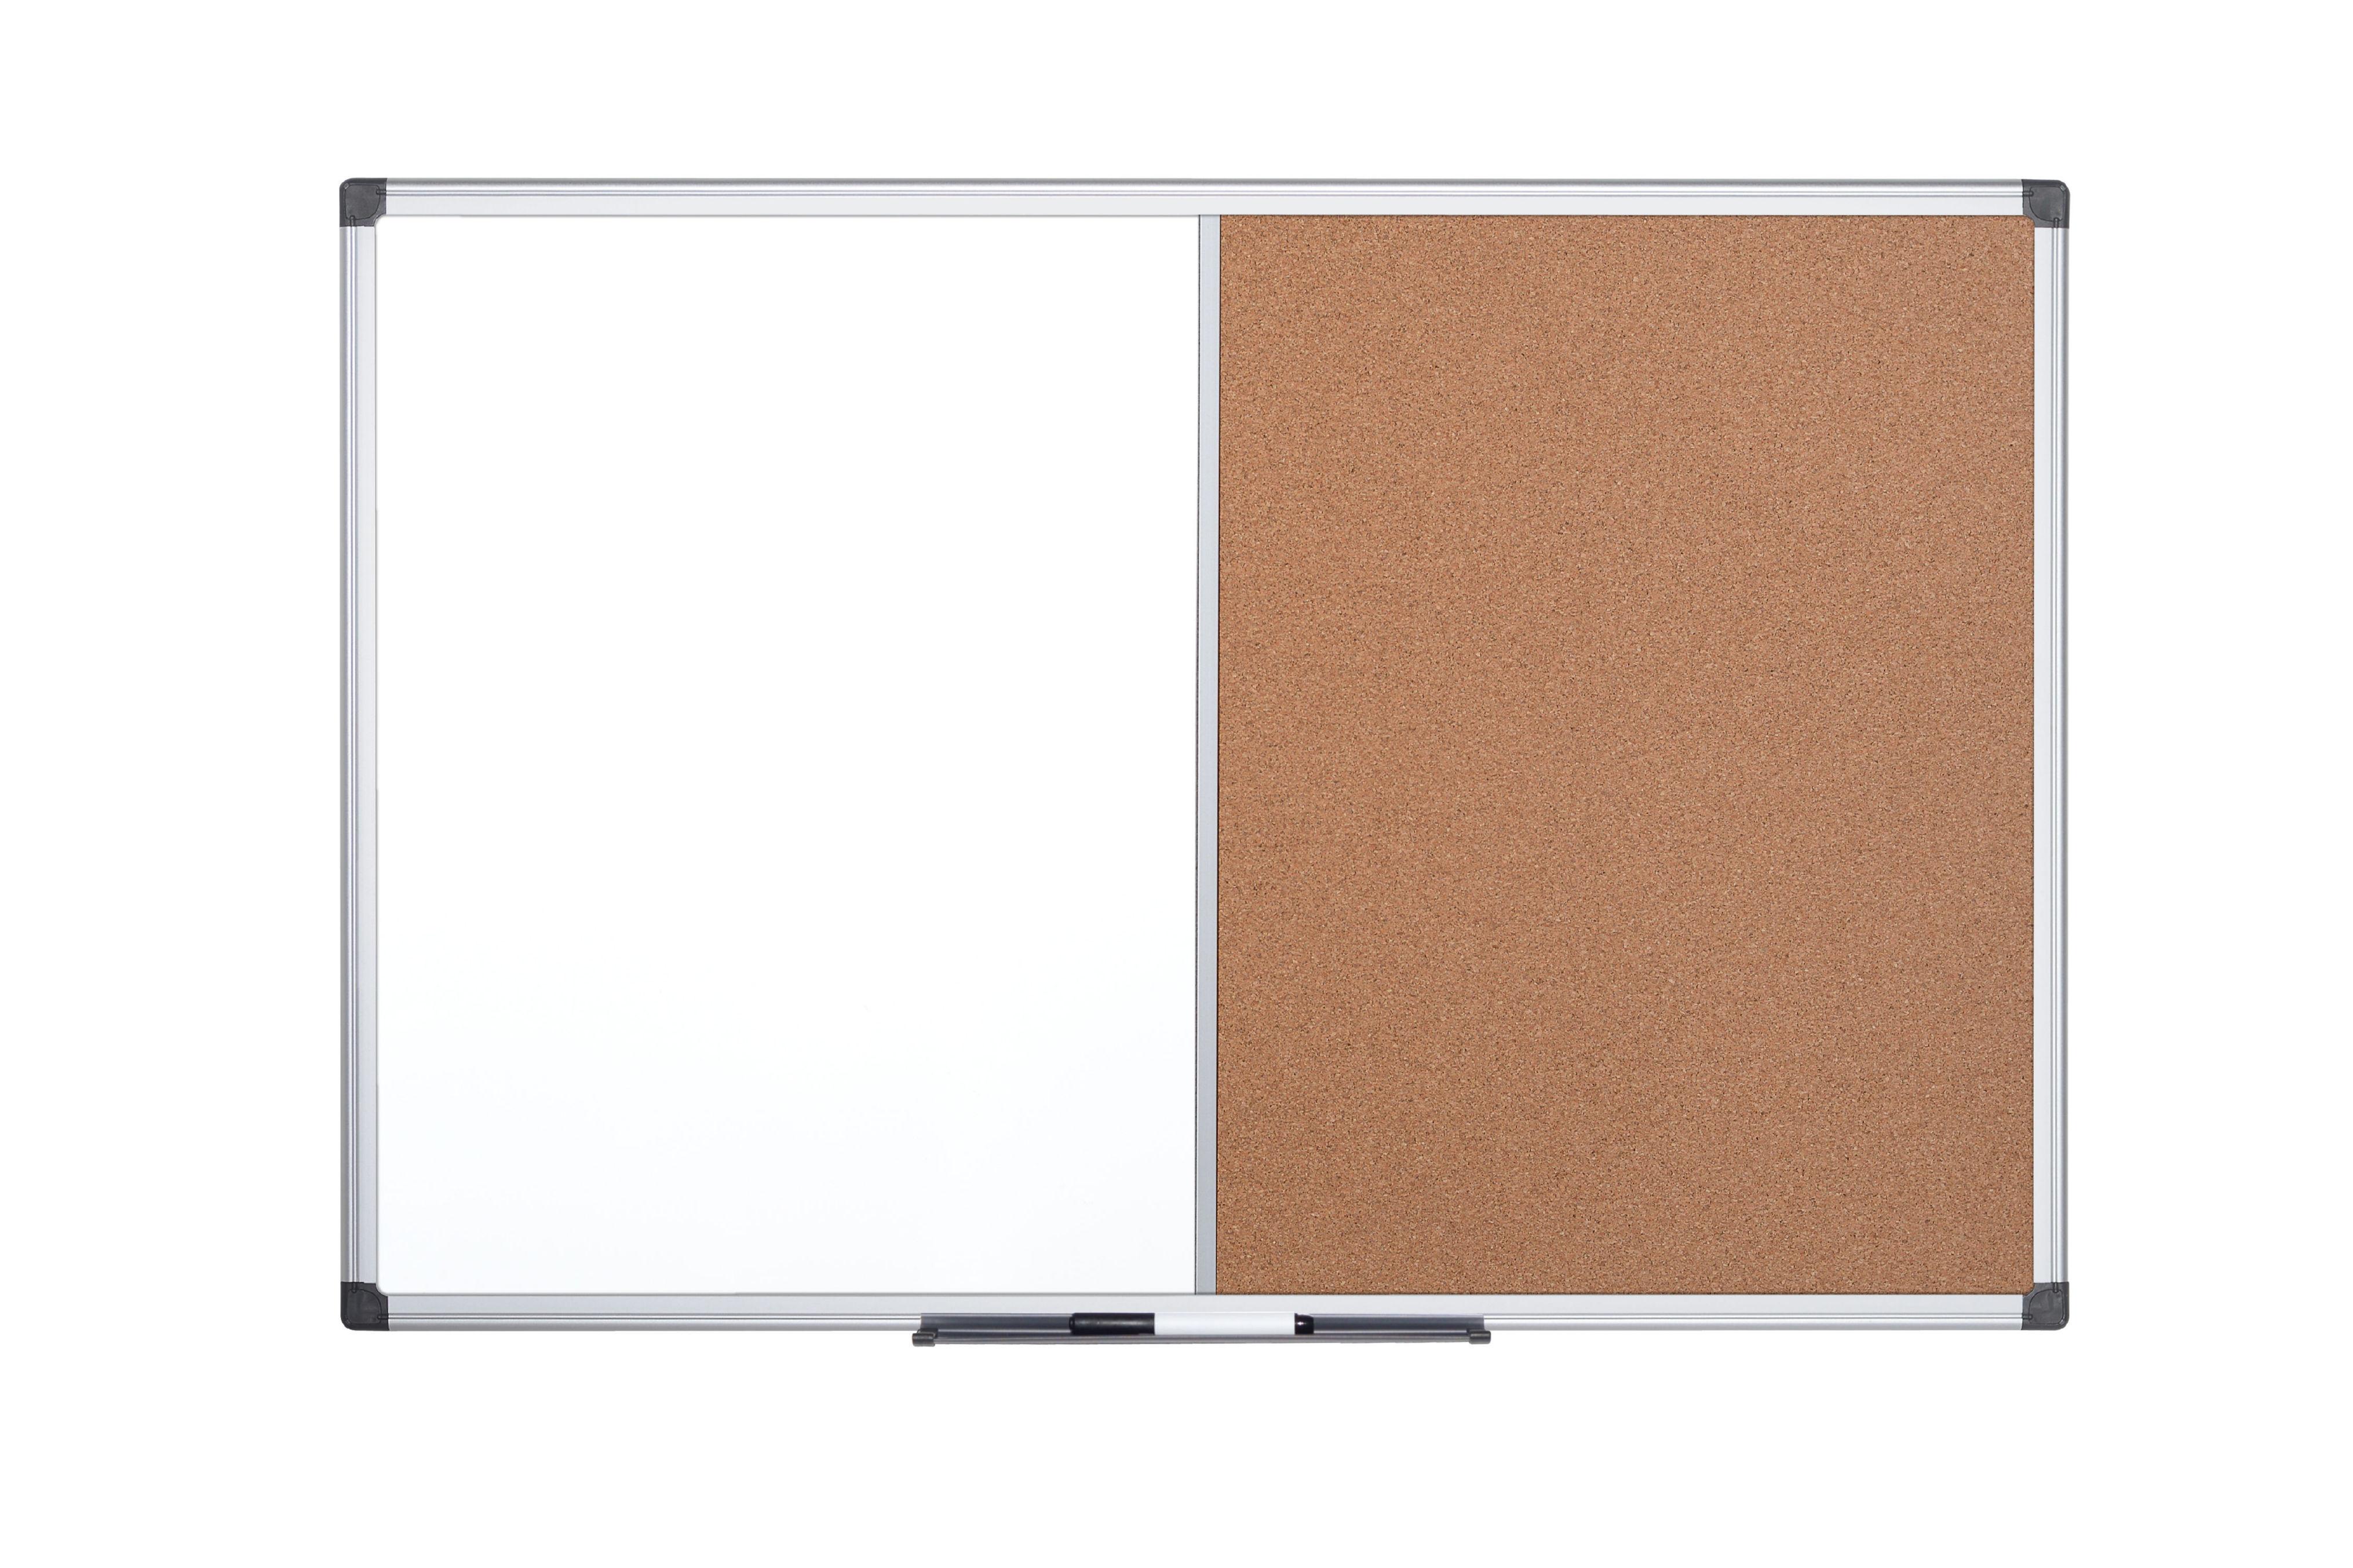 Alu Frame comboBoard 90x60cm